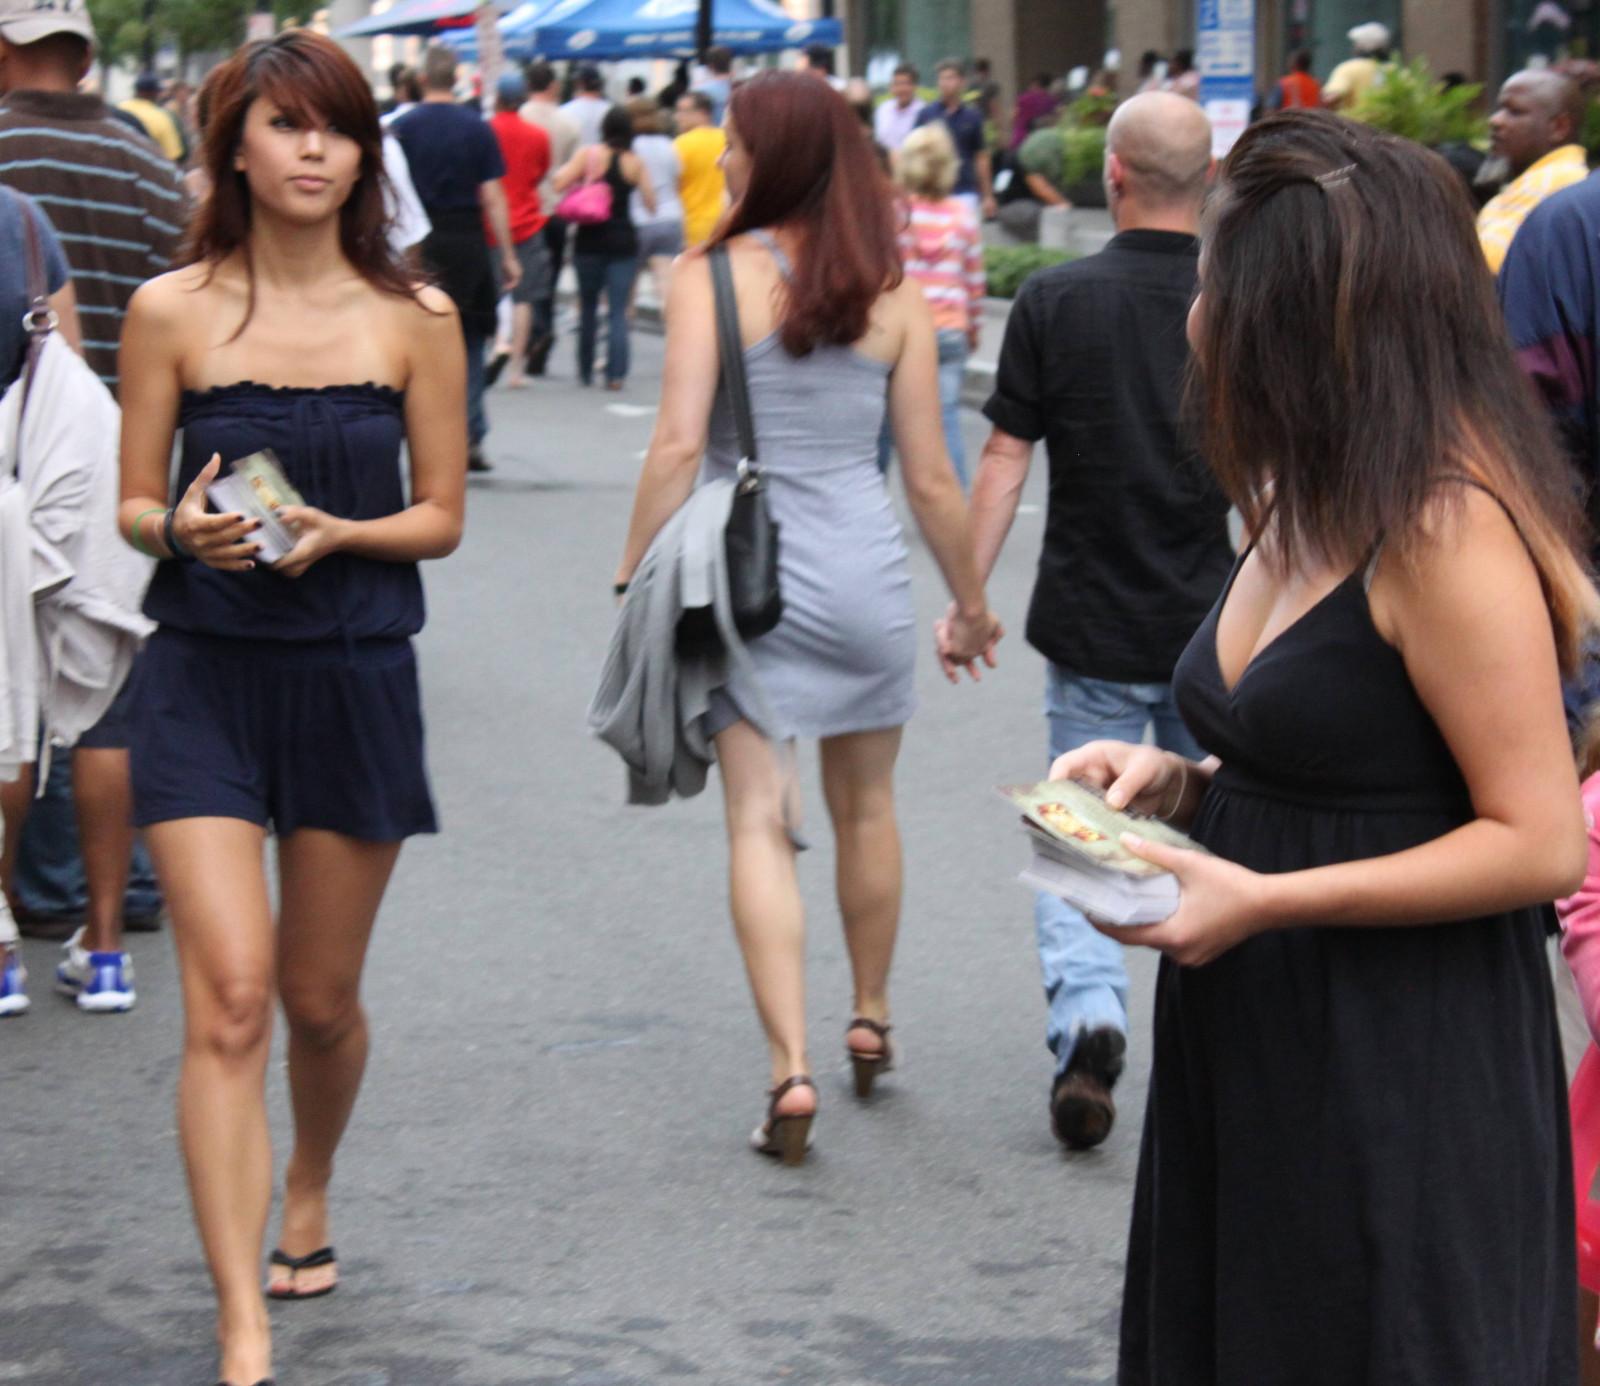 Wallpaper  Street, Asian, Dress, Cleavage, Fashion -9251